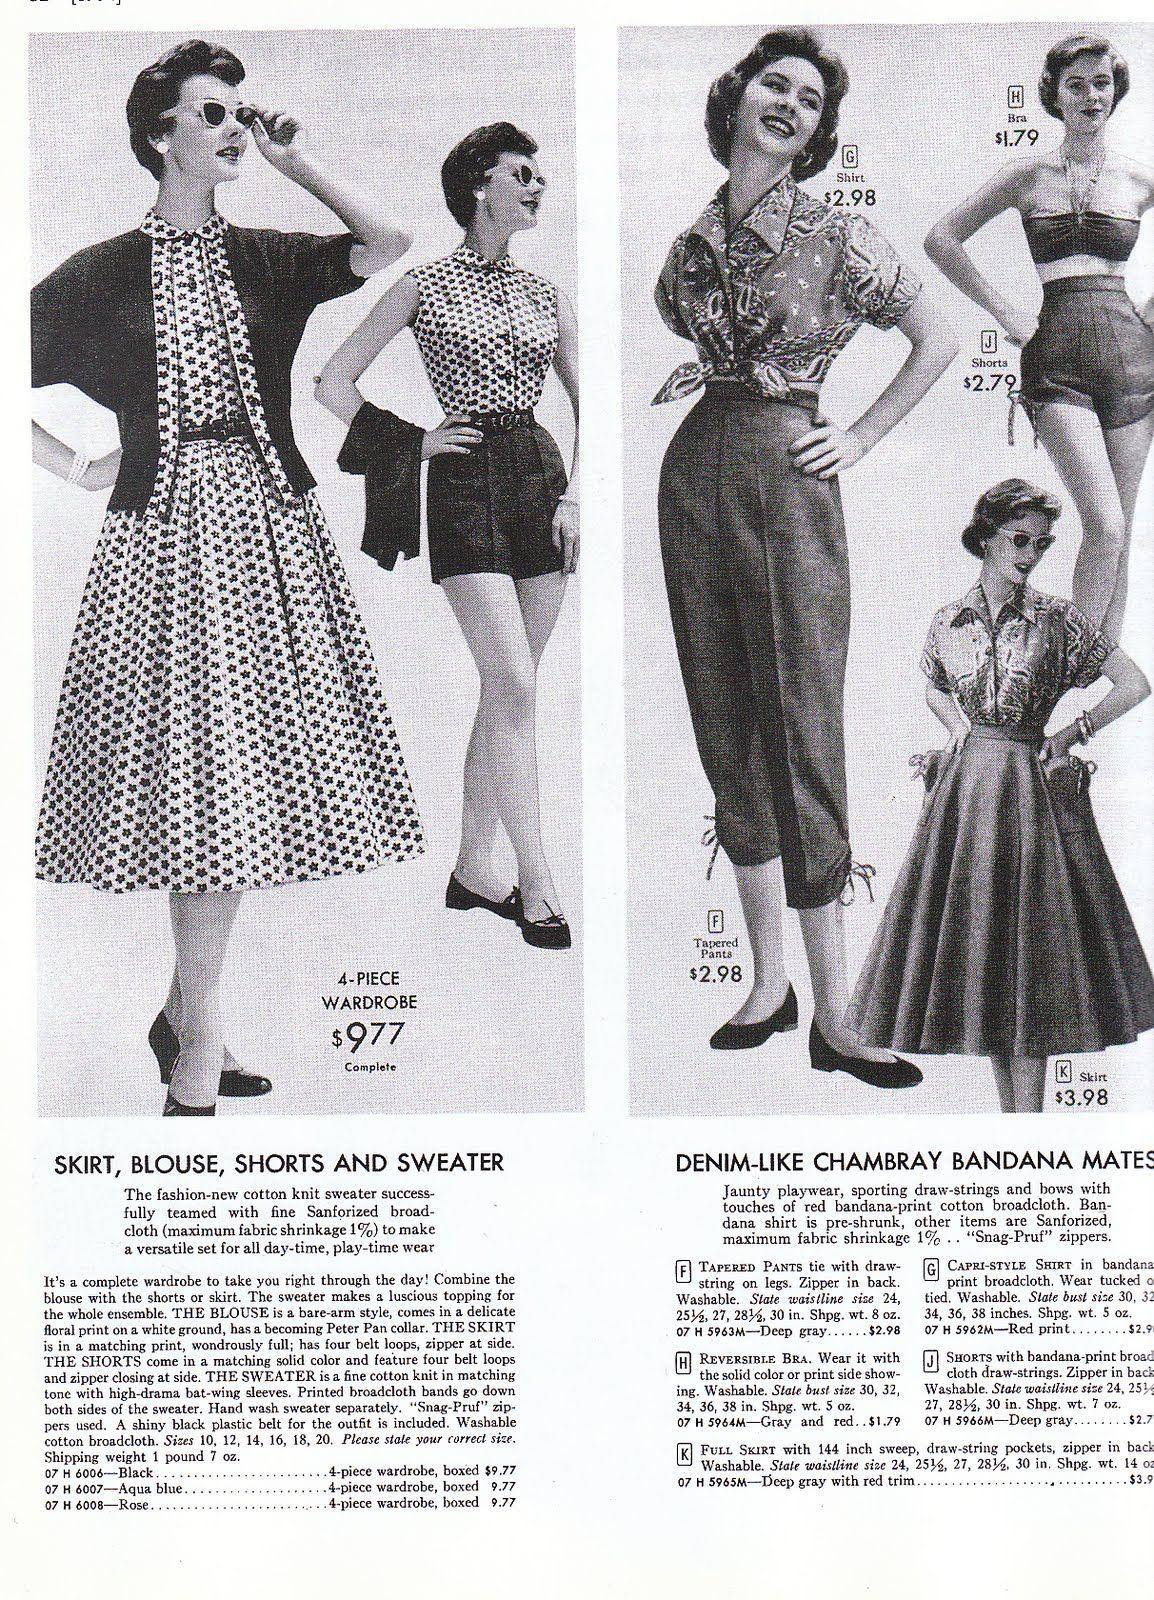 a62faf9ff67b0e 1950's fashion photos | Co. Inspo: 1950's Everyday Fashion | Guys ...